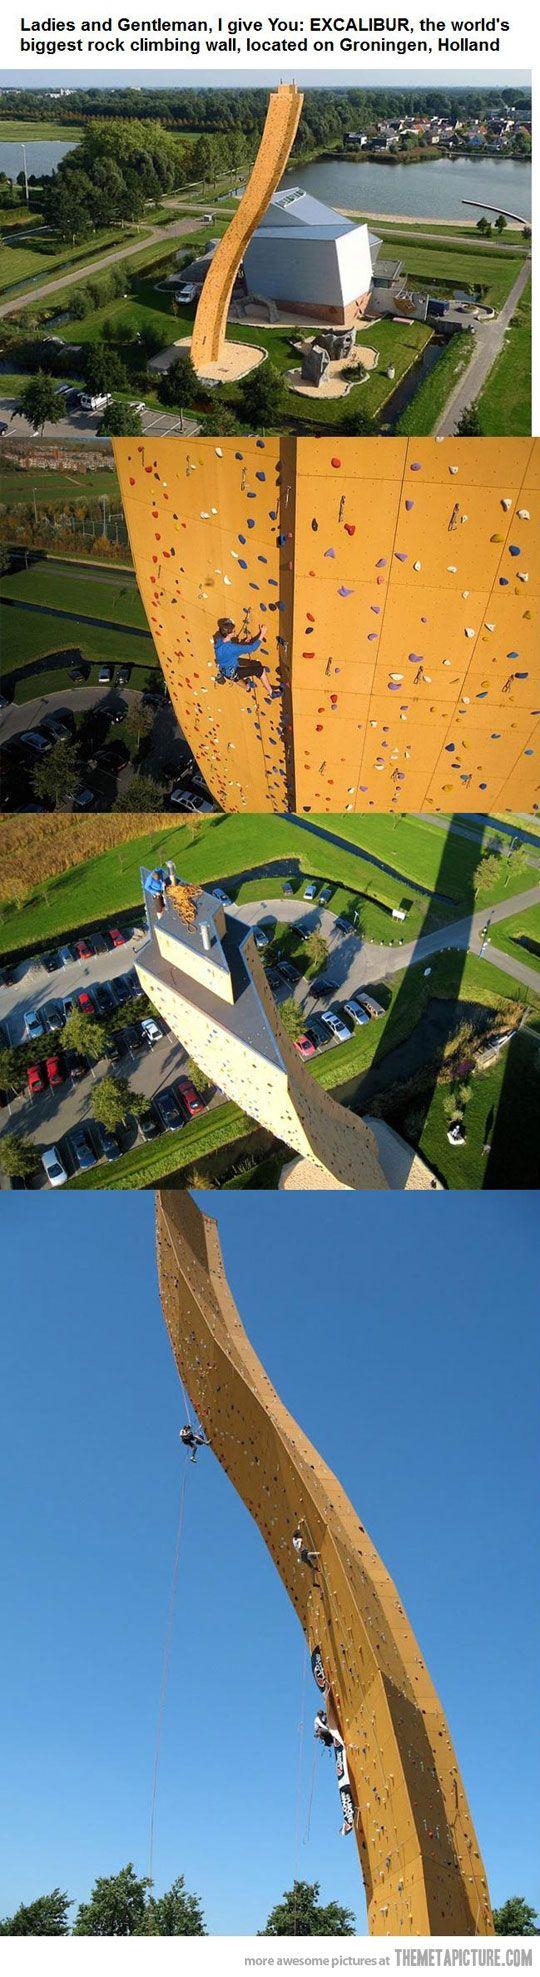 Largest Rock Climbing Wall - Groningen, Holland